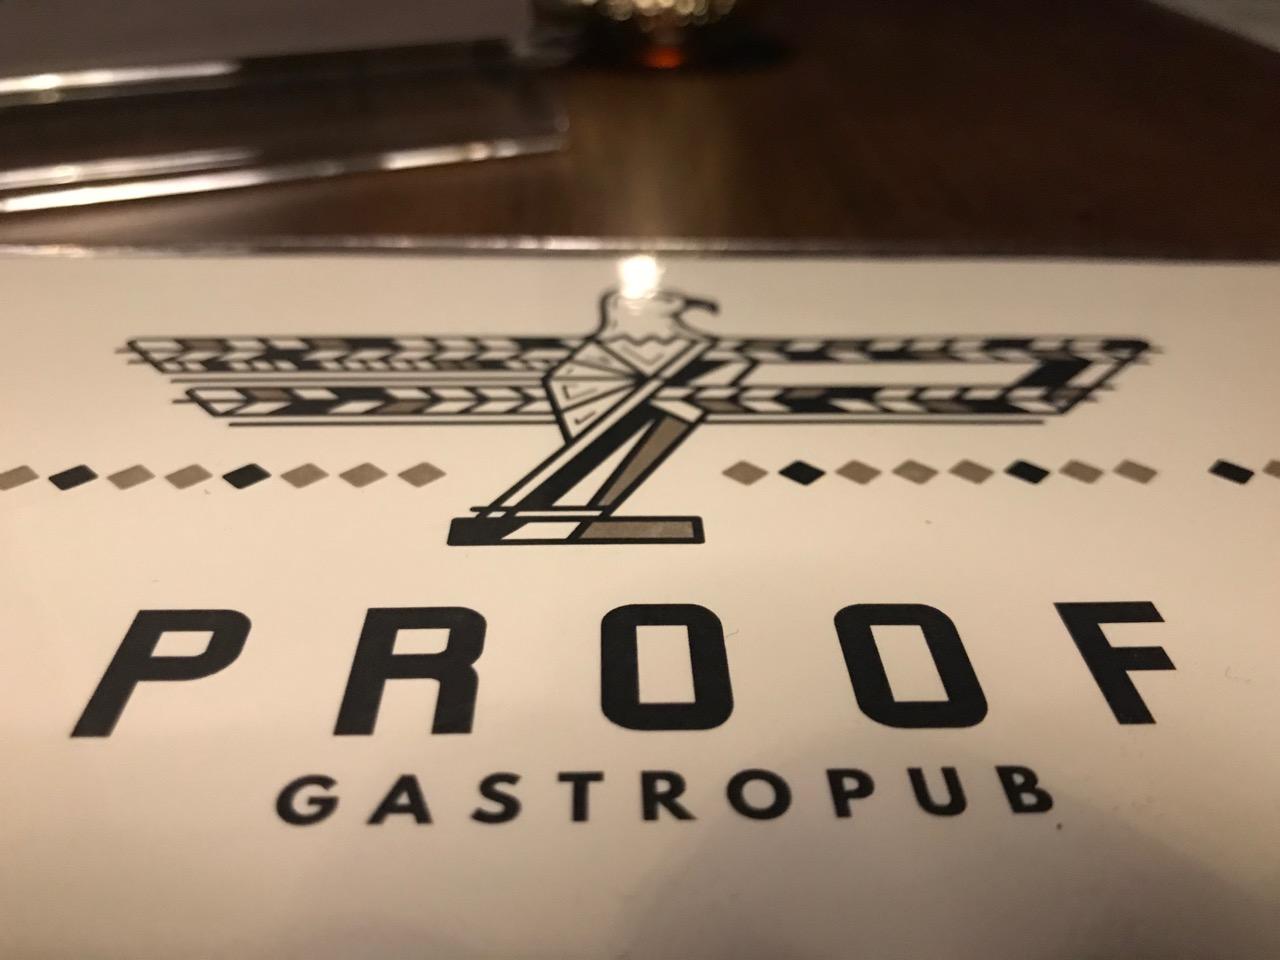 Dinner at PROOF – December 29th 2017